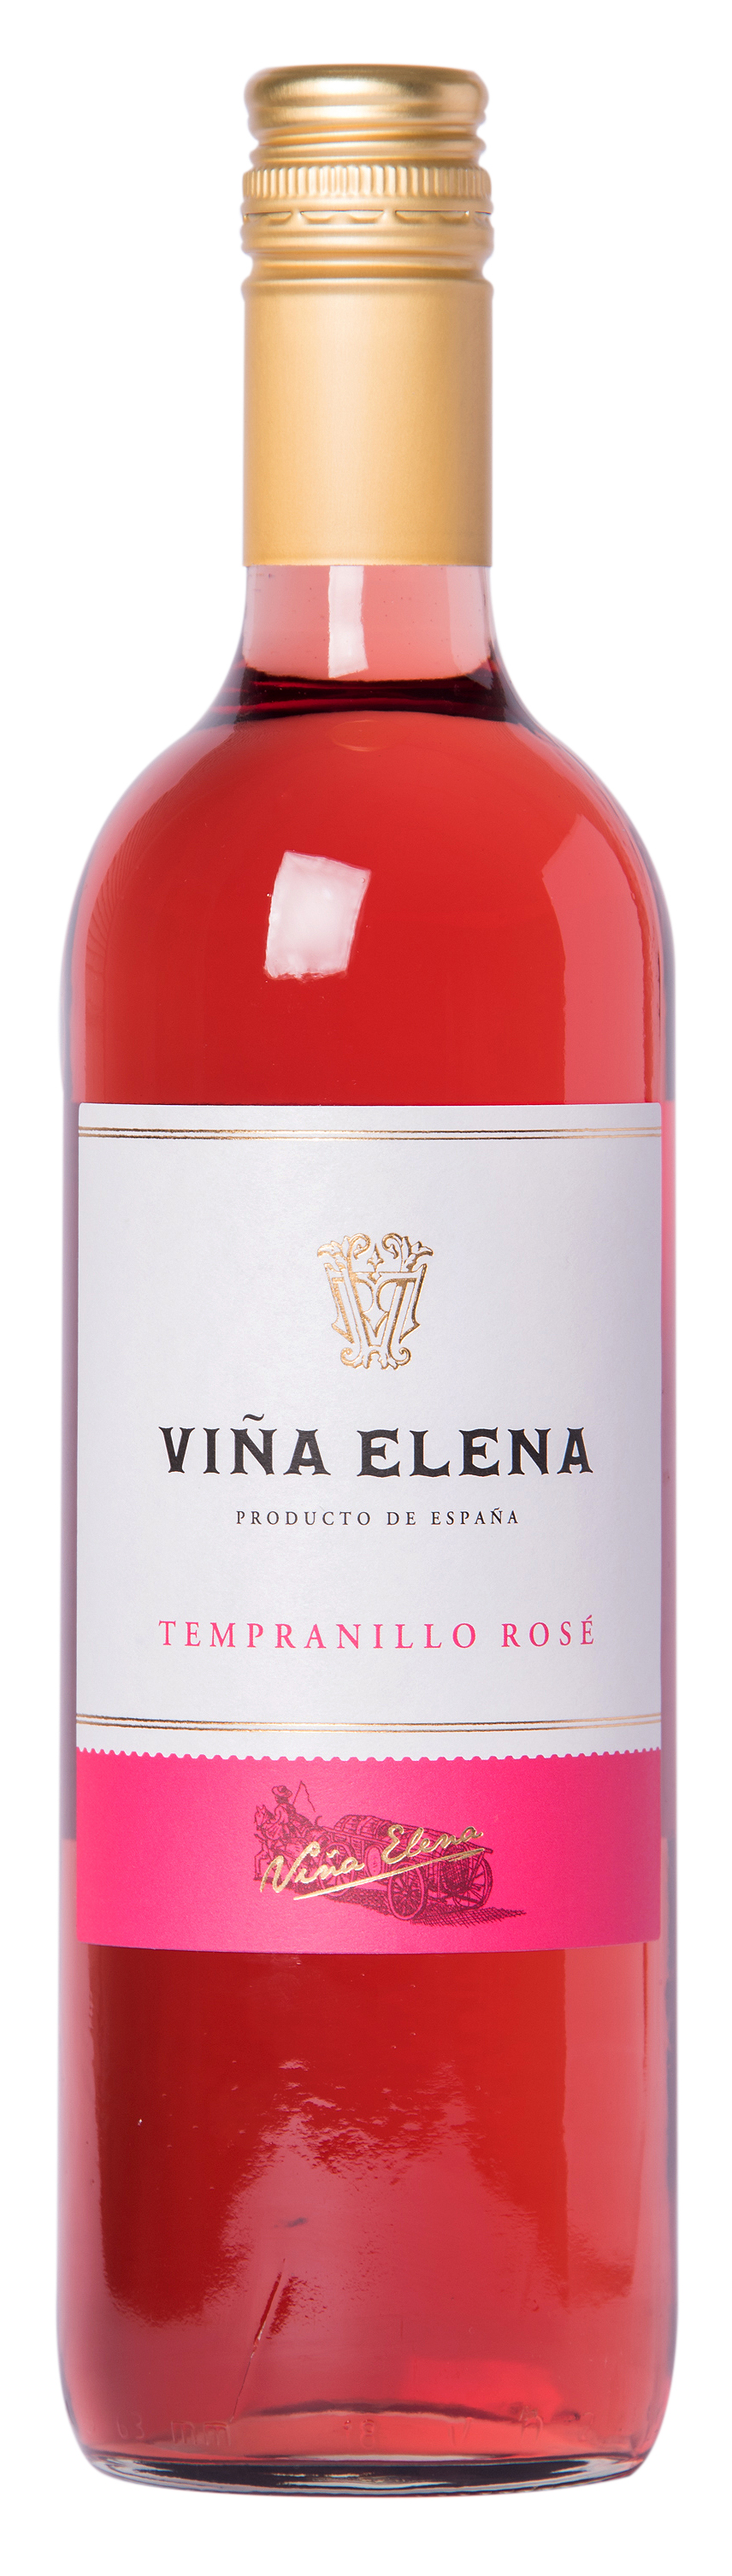 Vina Elena Tempranillo Rose 75cl